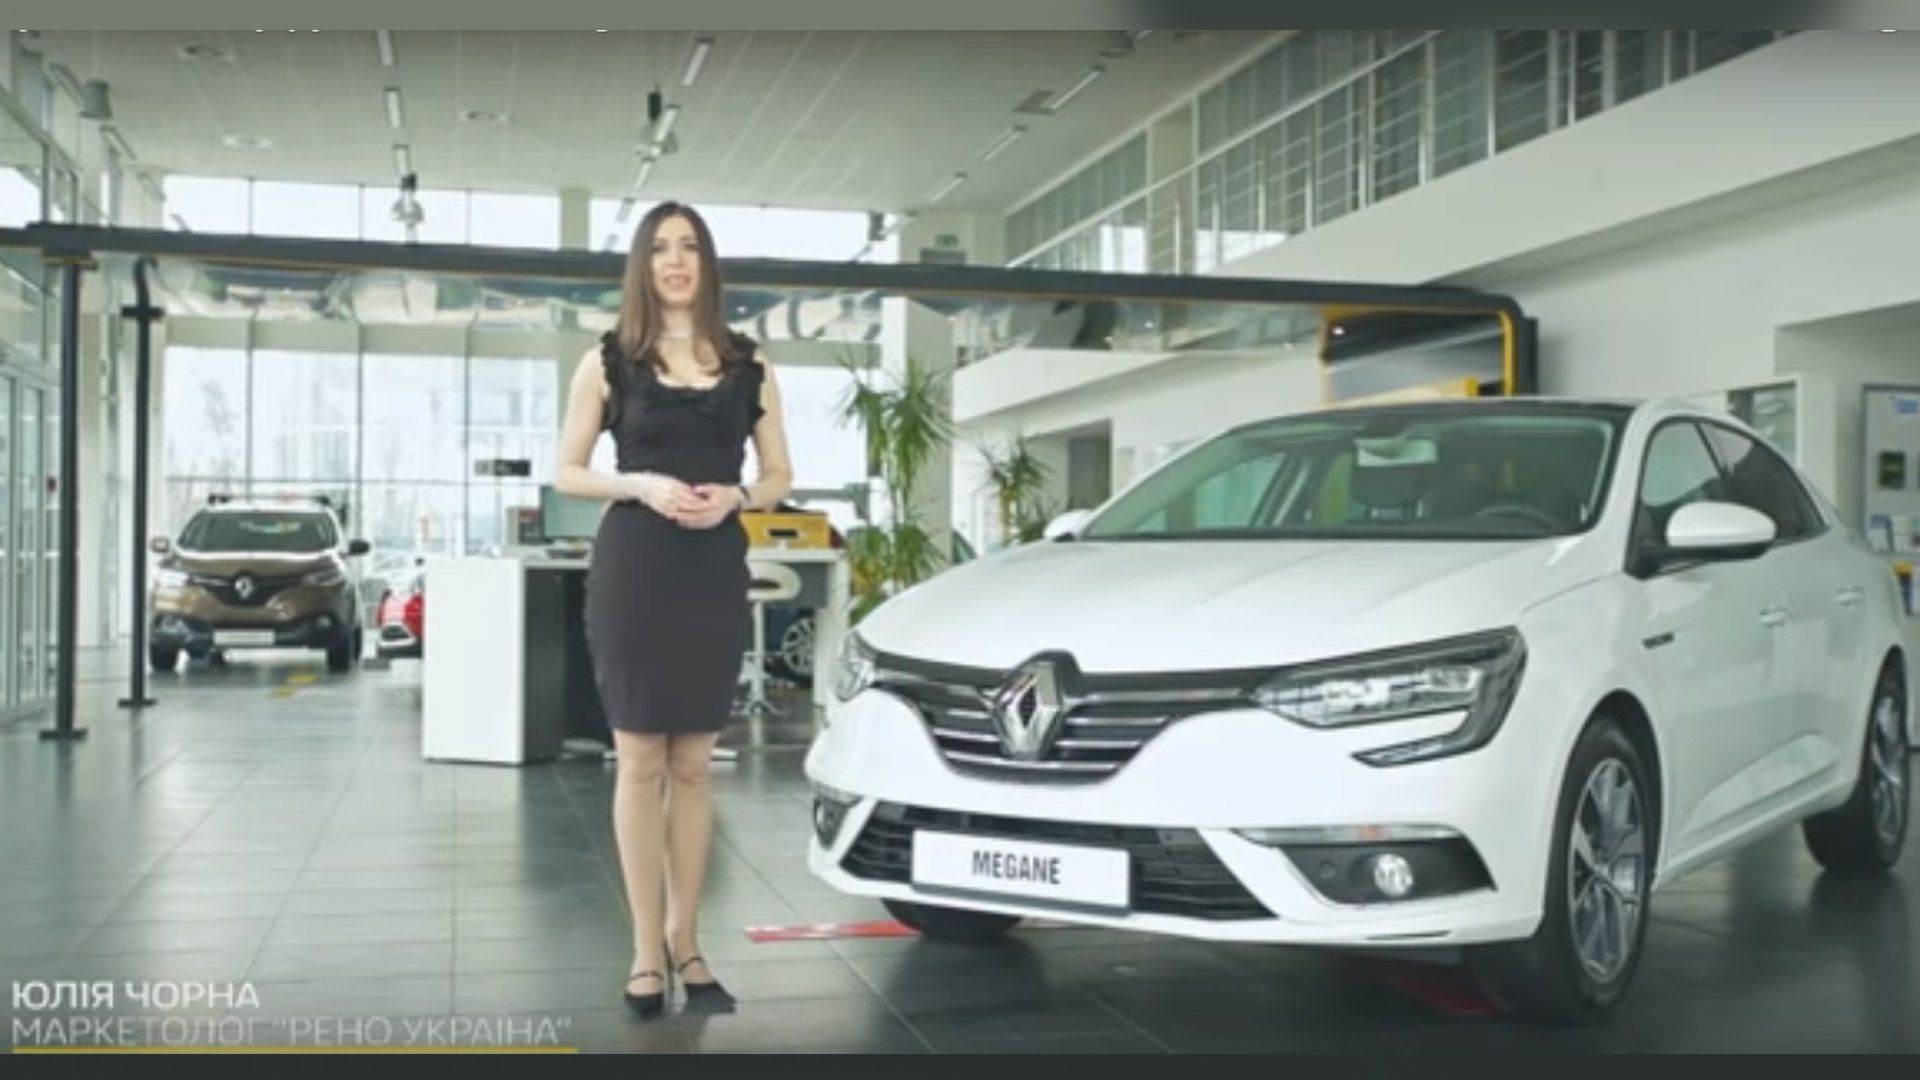 Виртуальный шоу-рум Renault Megane Седан